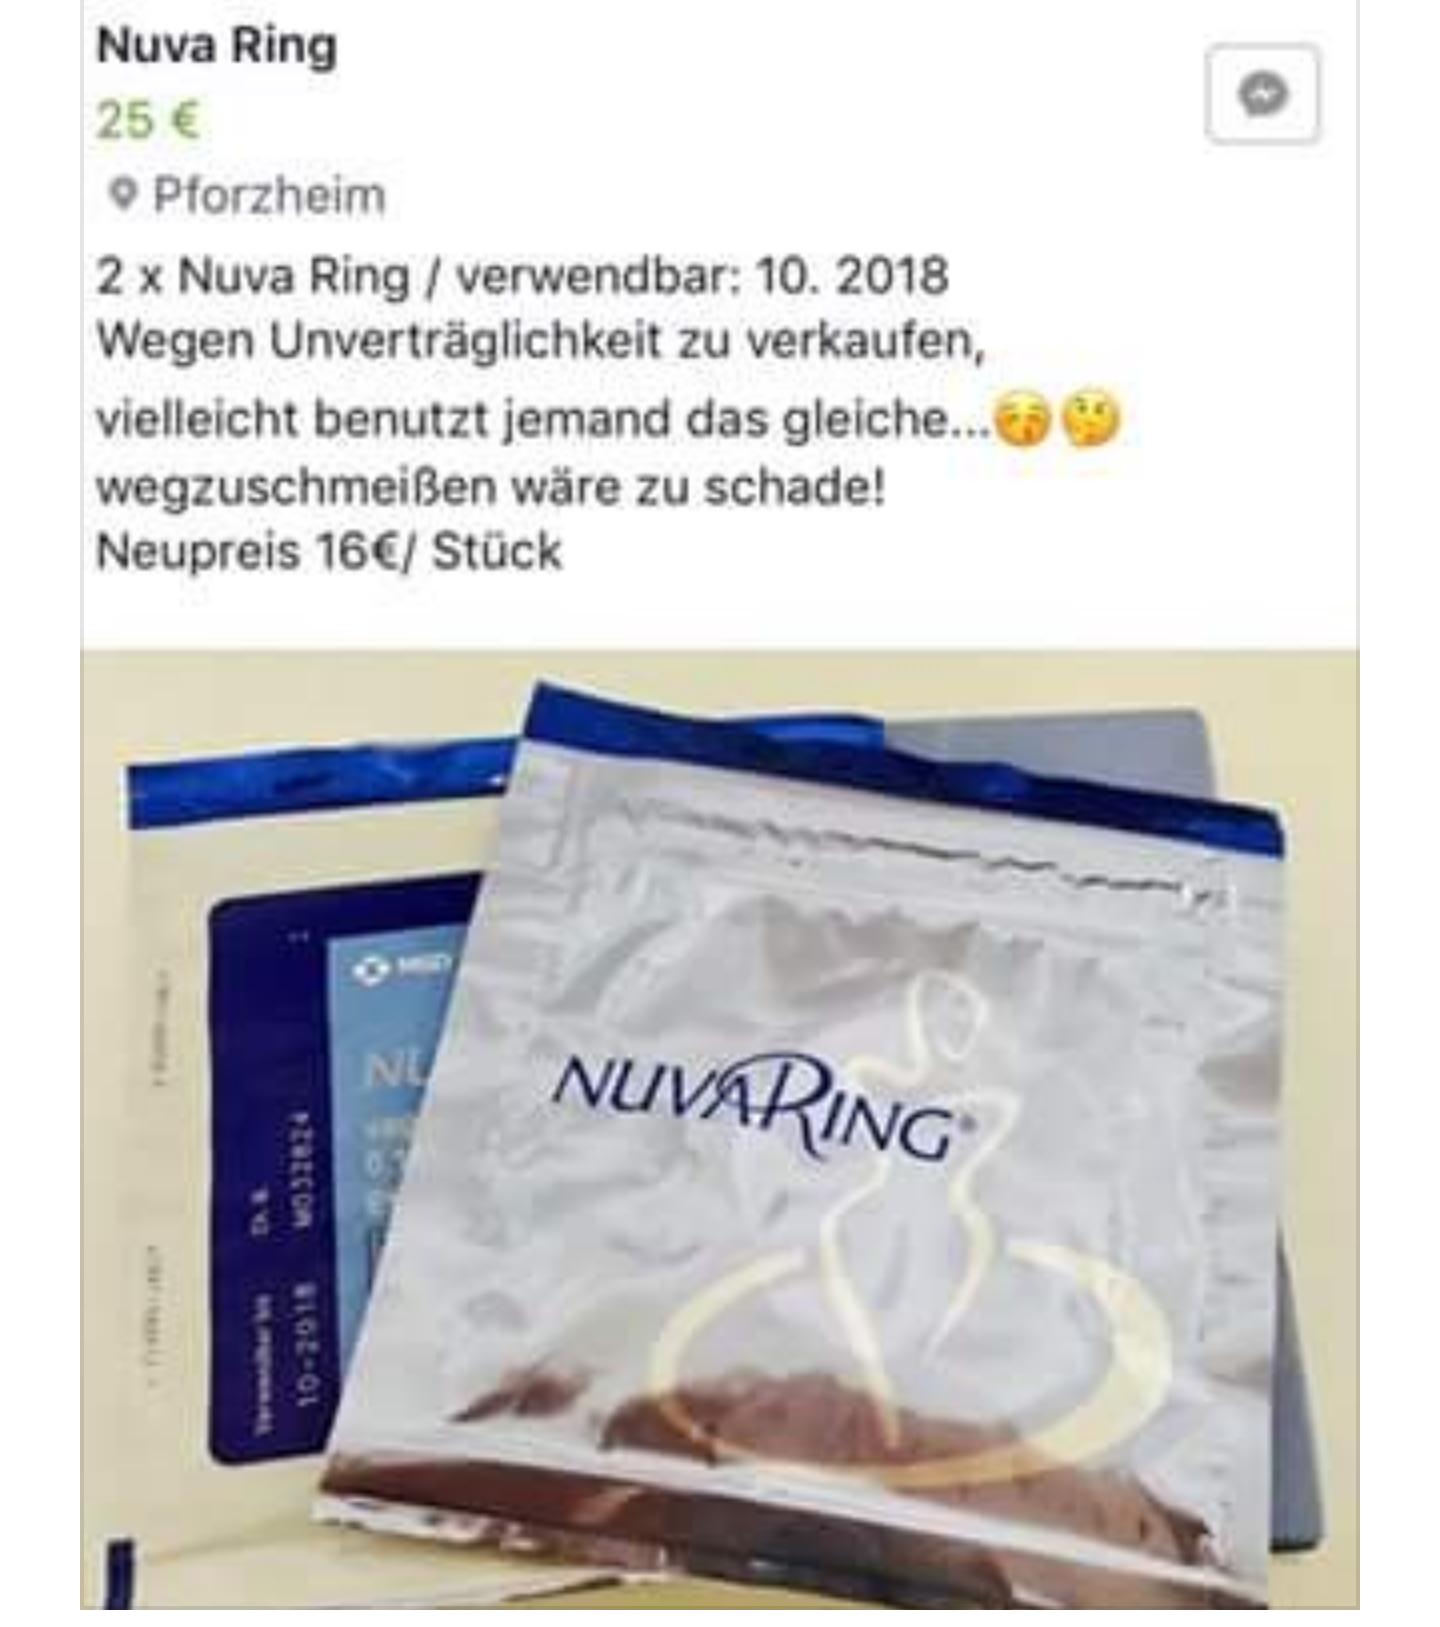 Online Apotheken Und Preisbindung Apothekentheater